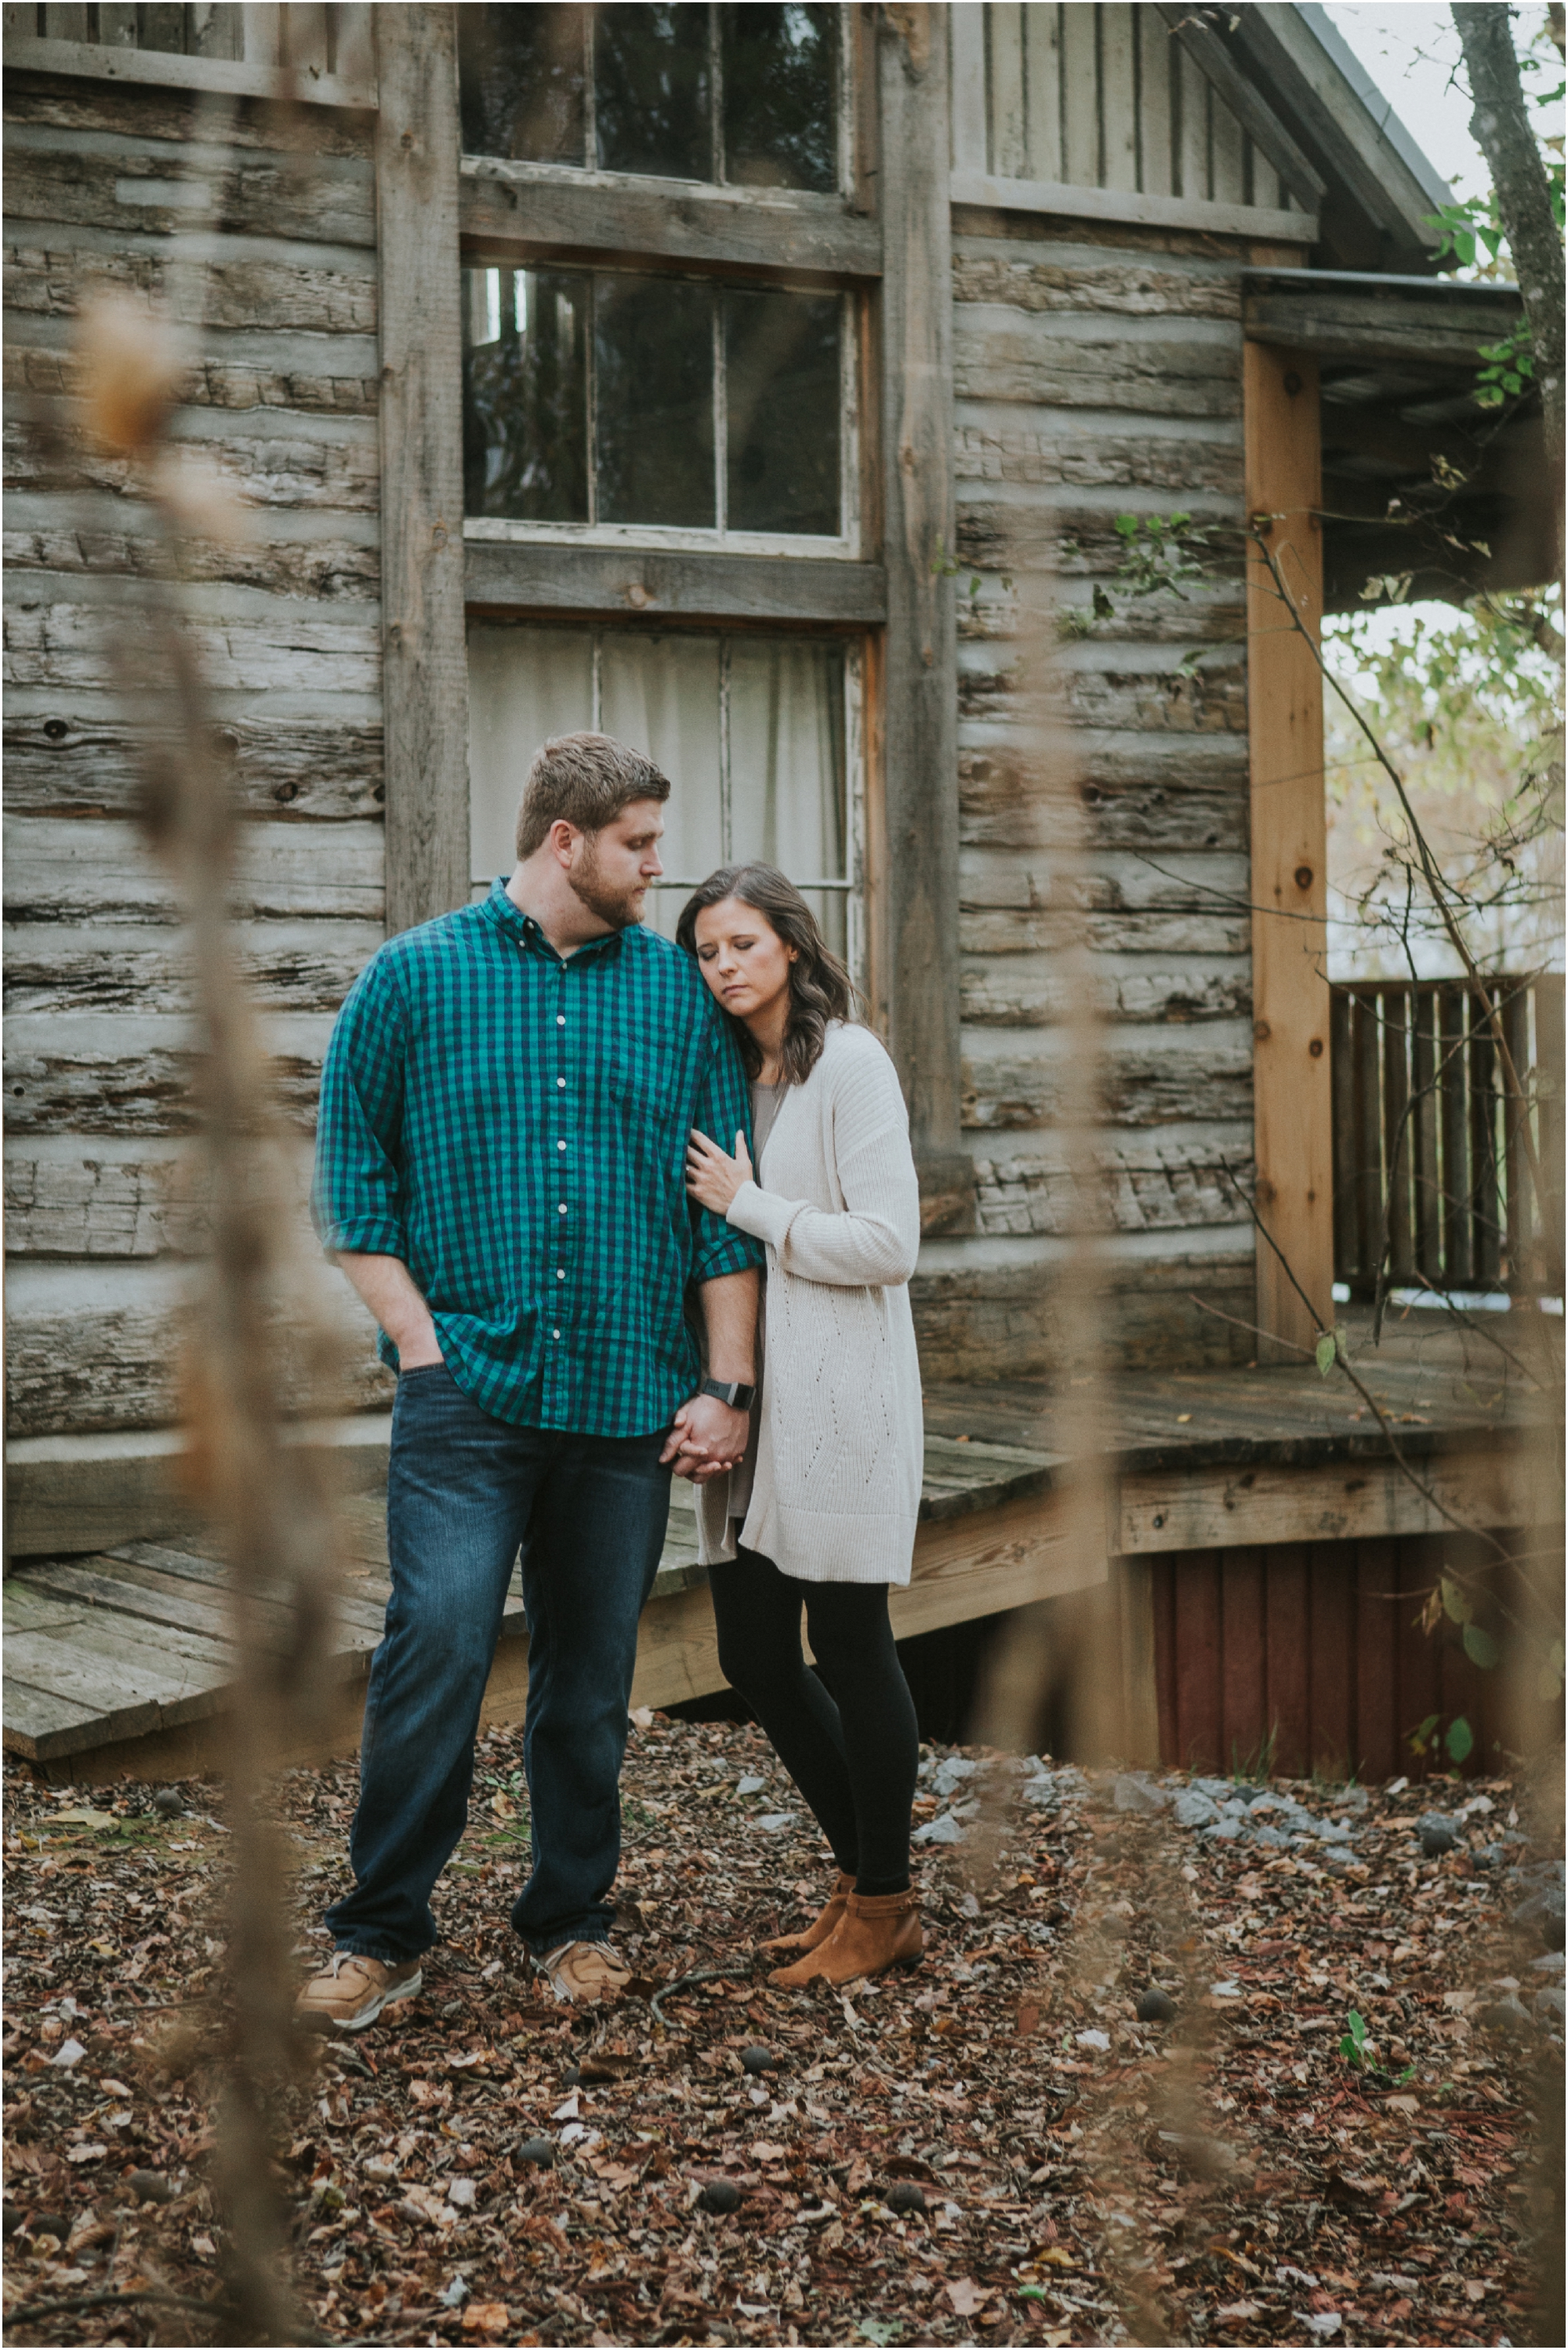 katy-sergent-millstone-limestone-tn-rustic-fall-engagement-session-adventurous-outdoors-intimate-elopement-wedding-northeast-johnson-city-photographer_0031.jpg